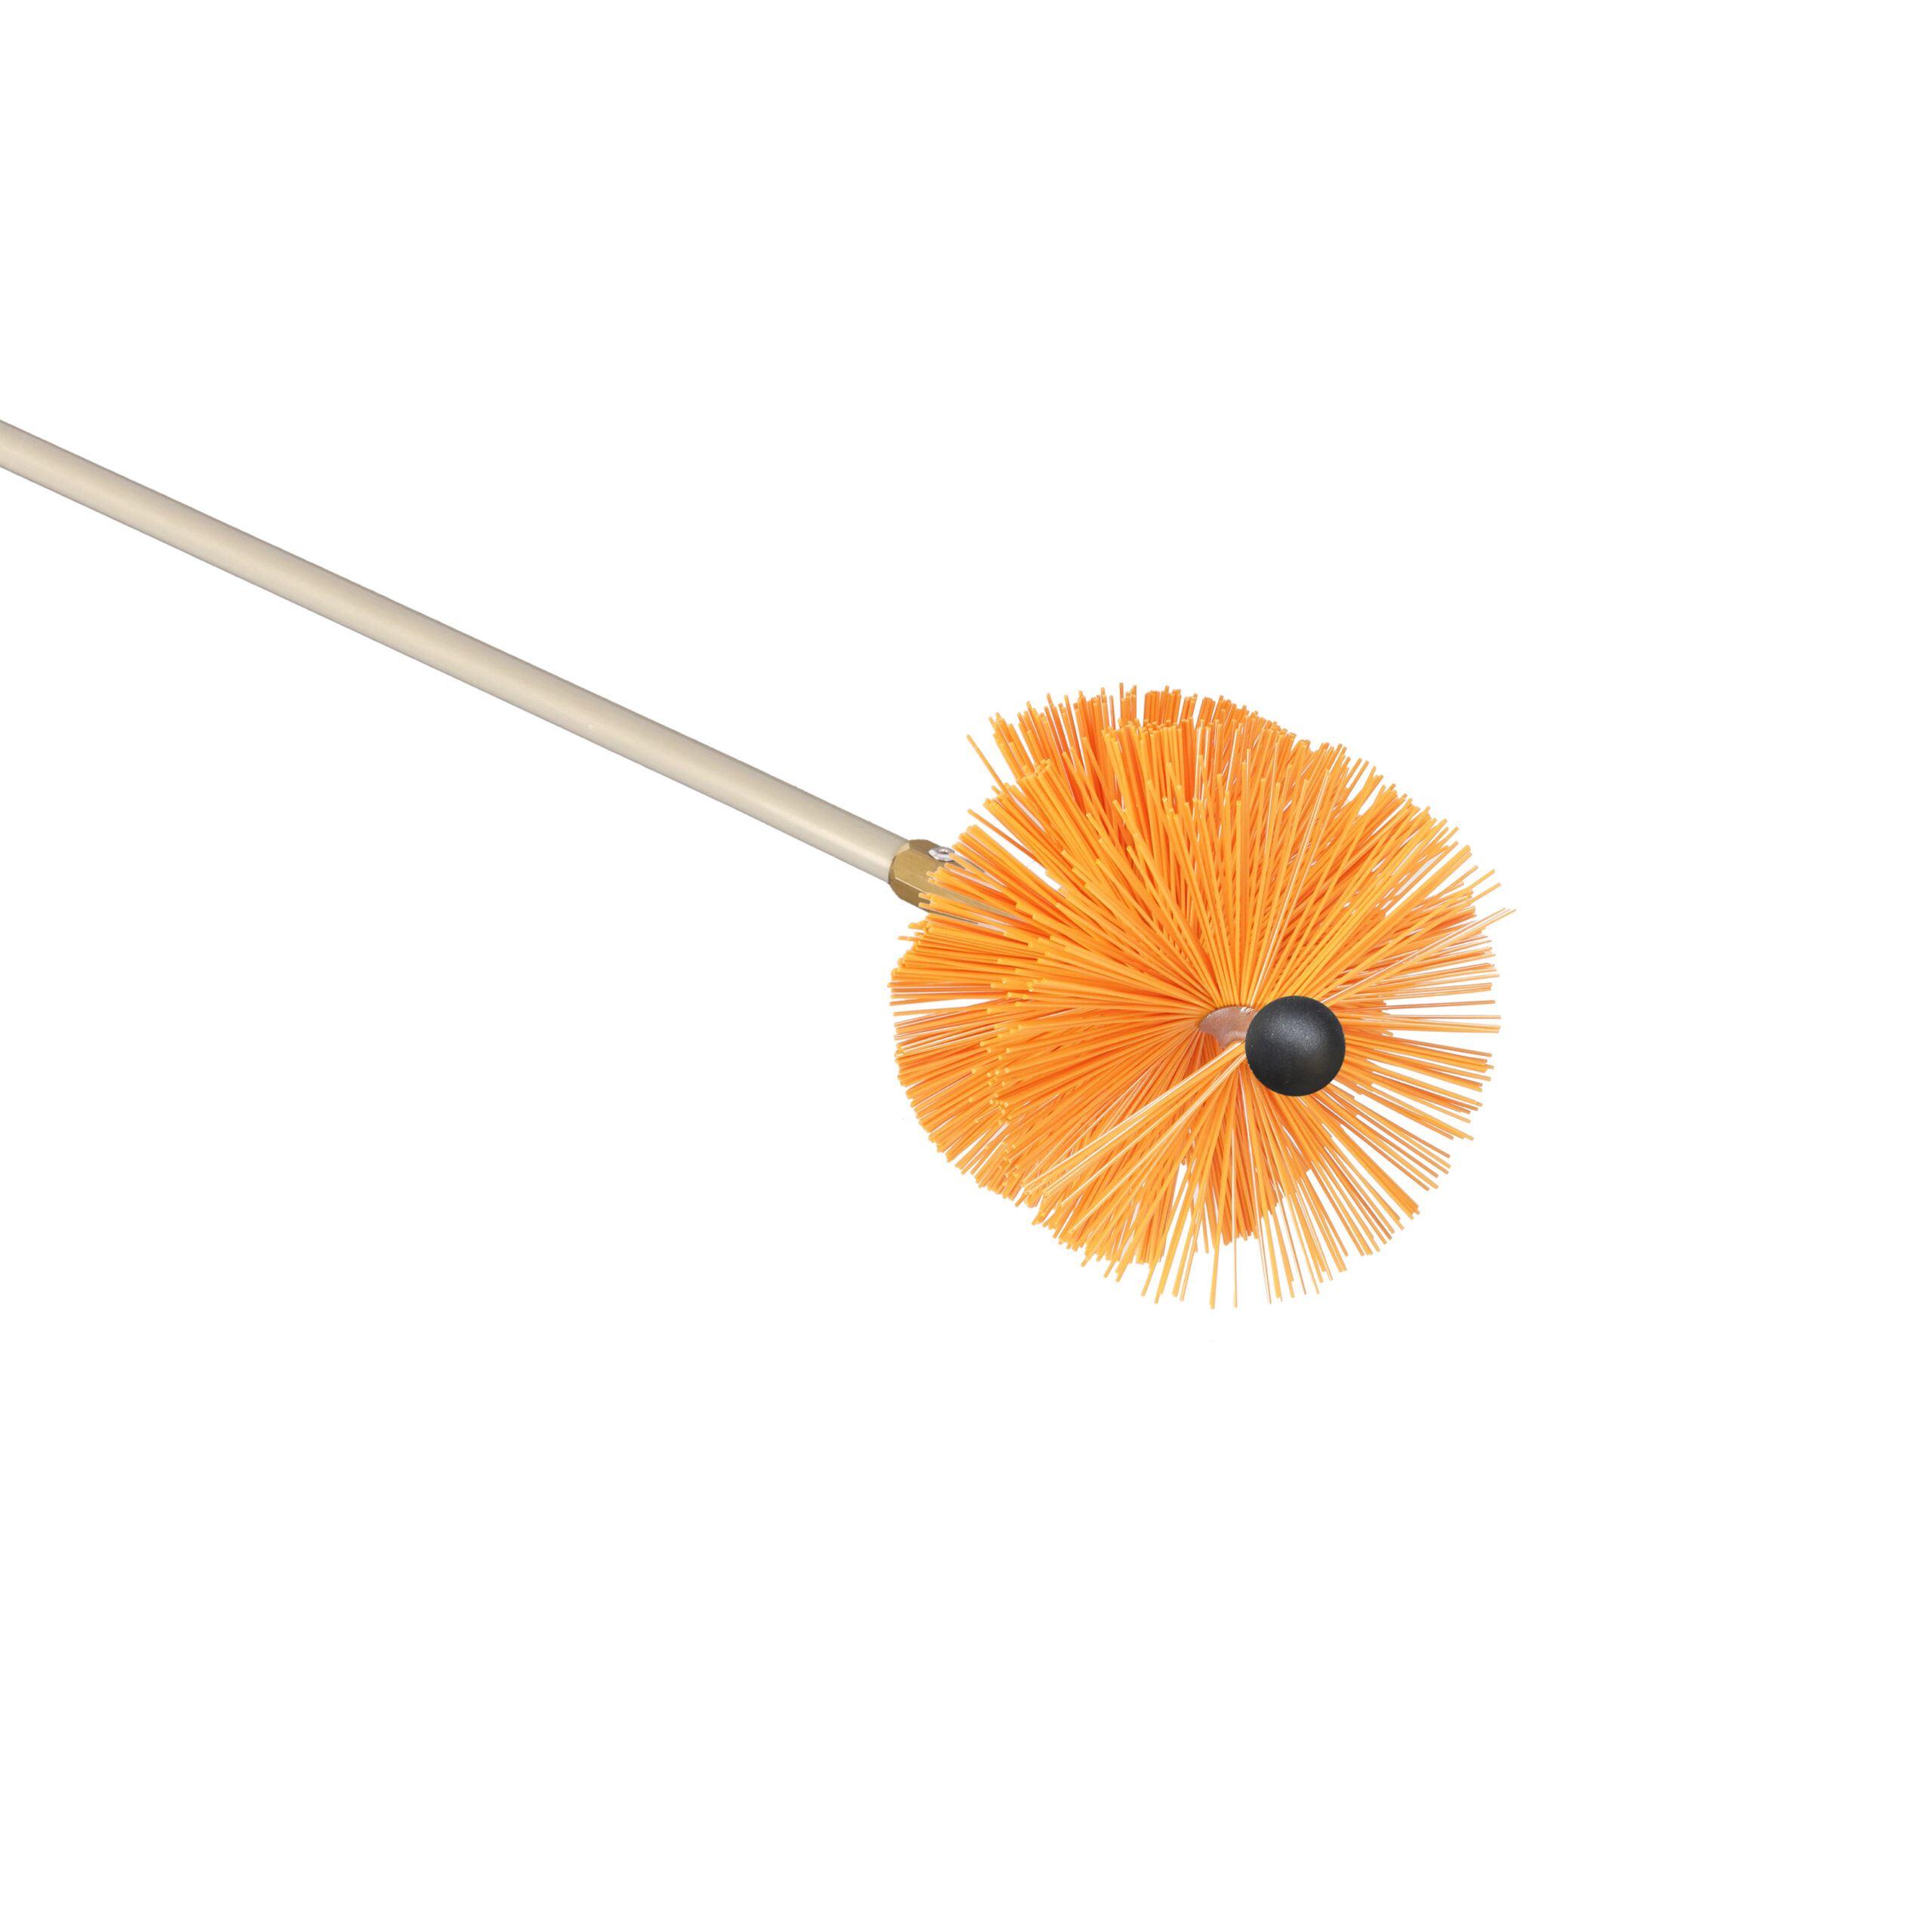 6″ Medium Bristle Chimney Brush